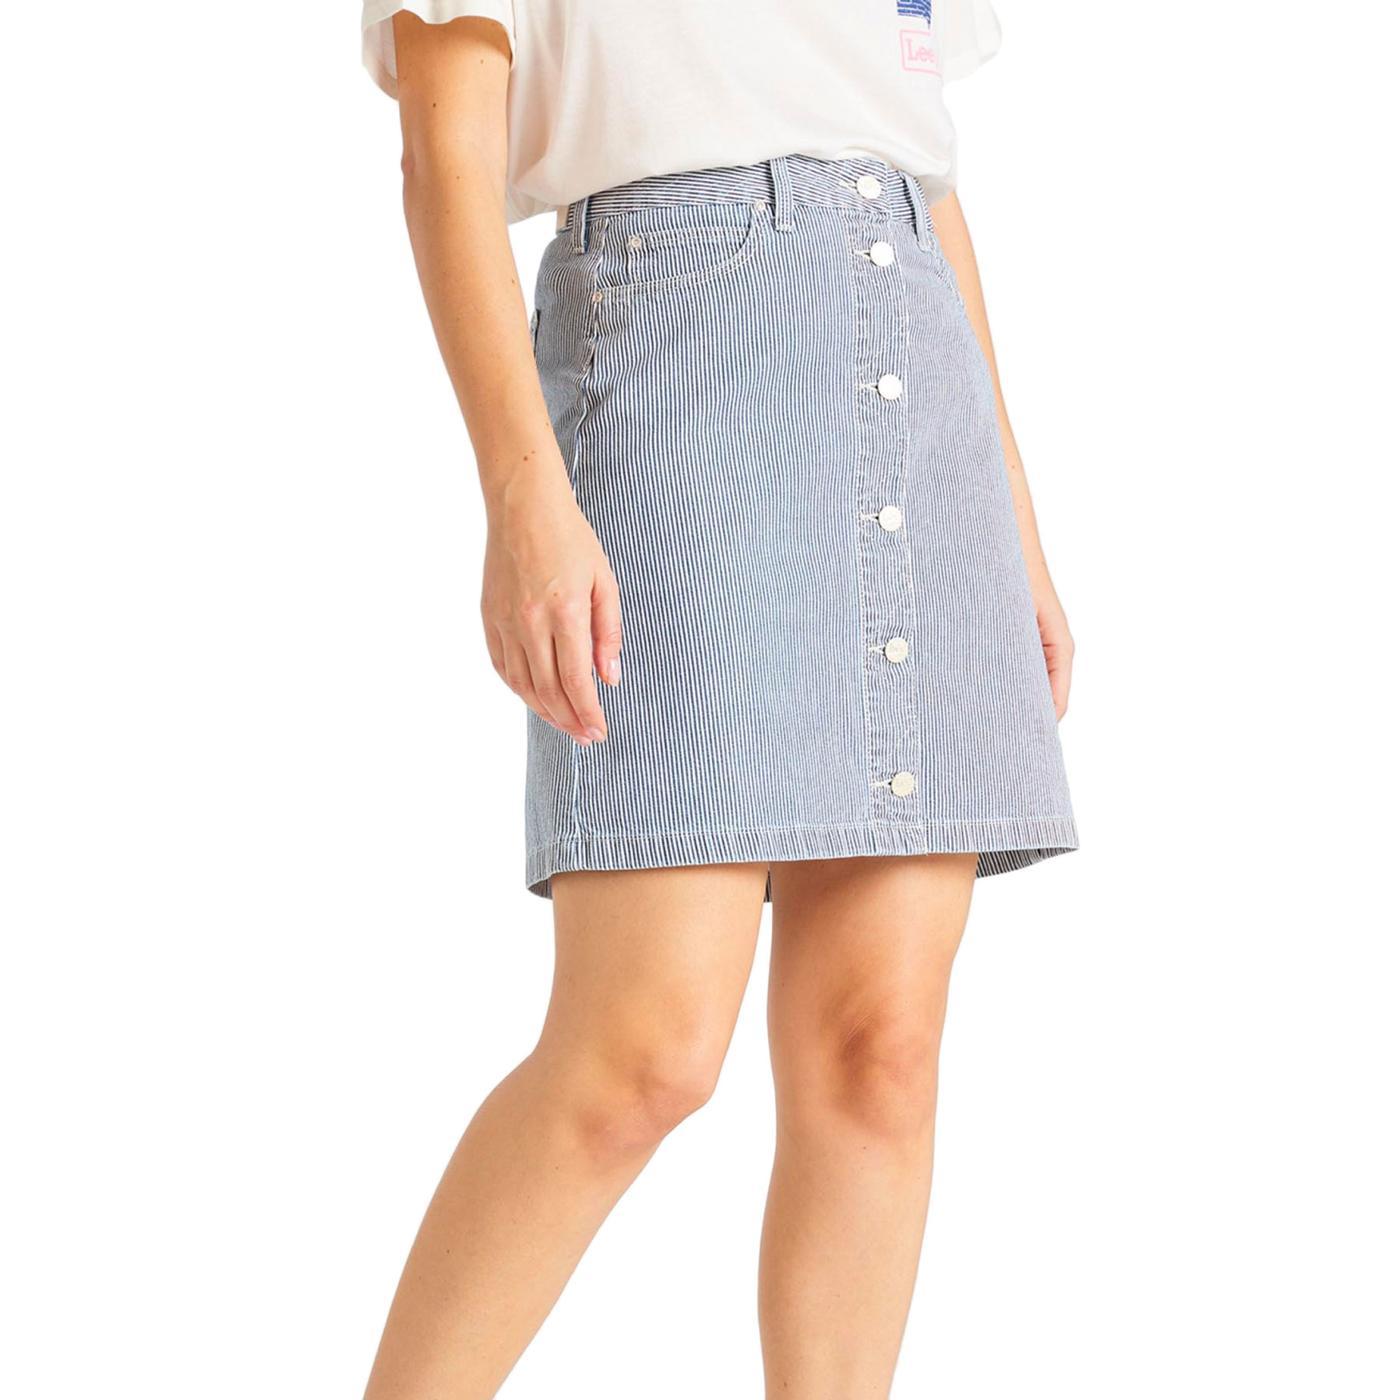 LEE JEANS Retro Hickory Stripe A-line Mini Skirt